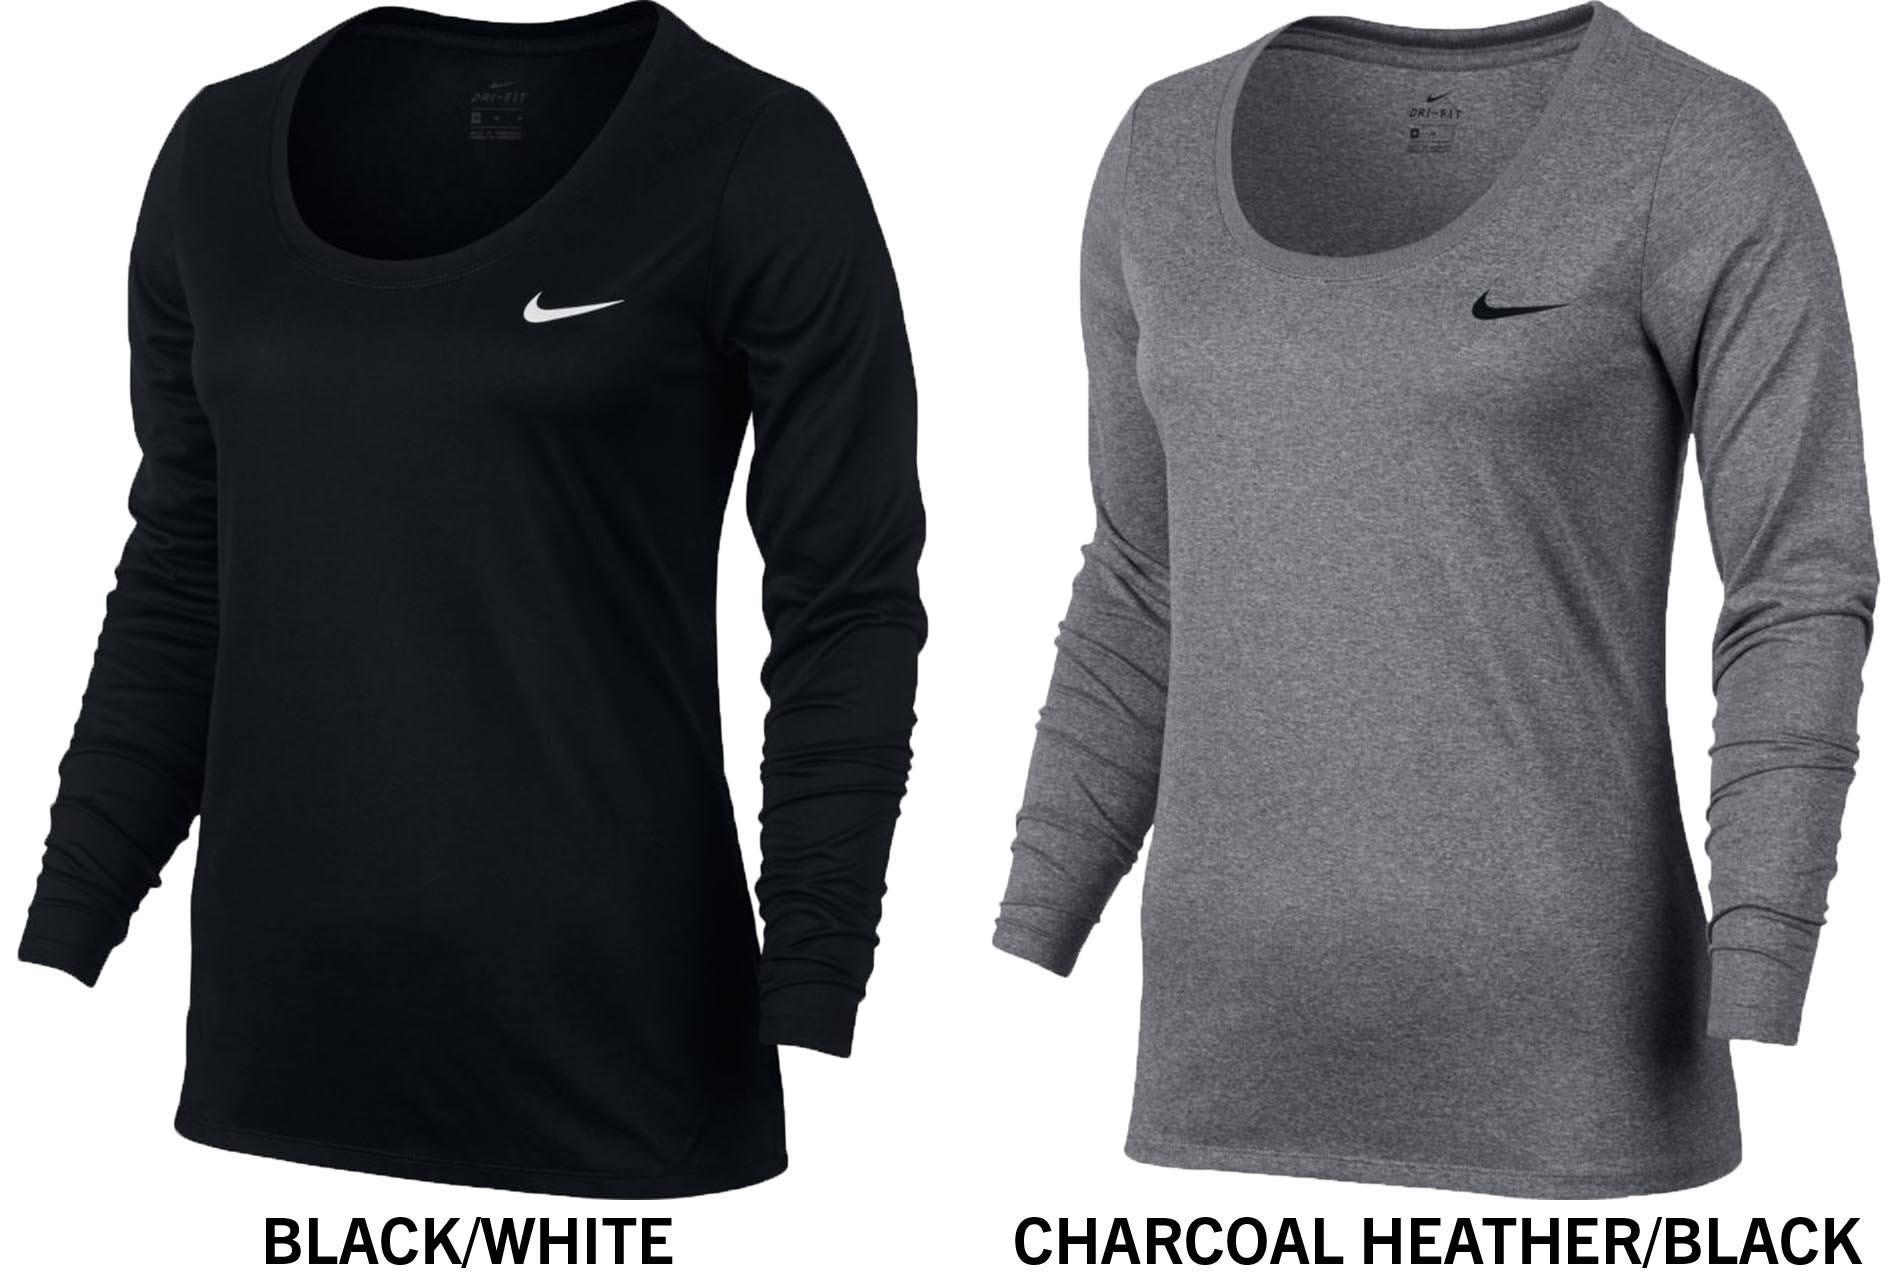 8cad5128ba2f Nike Dri-FIT Legend Women s Long Sleeve Training T-Shirt